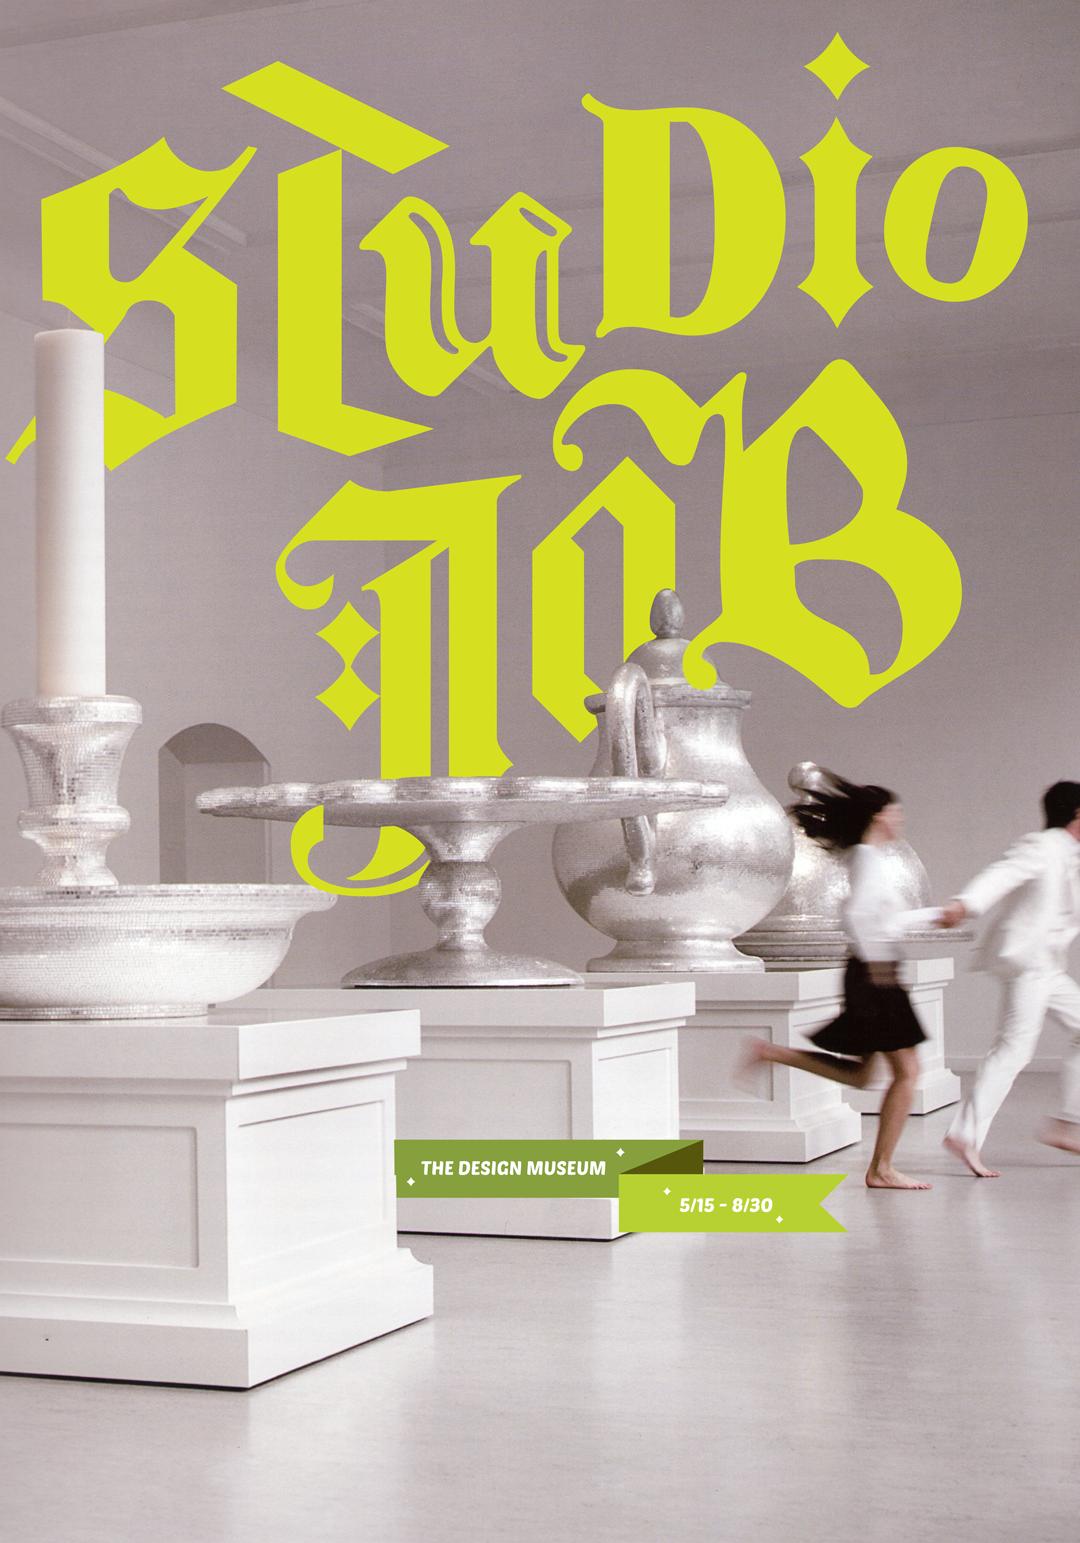 StudioJob_Posters(1).png